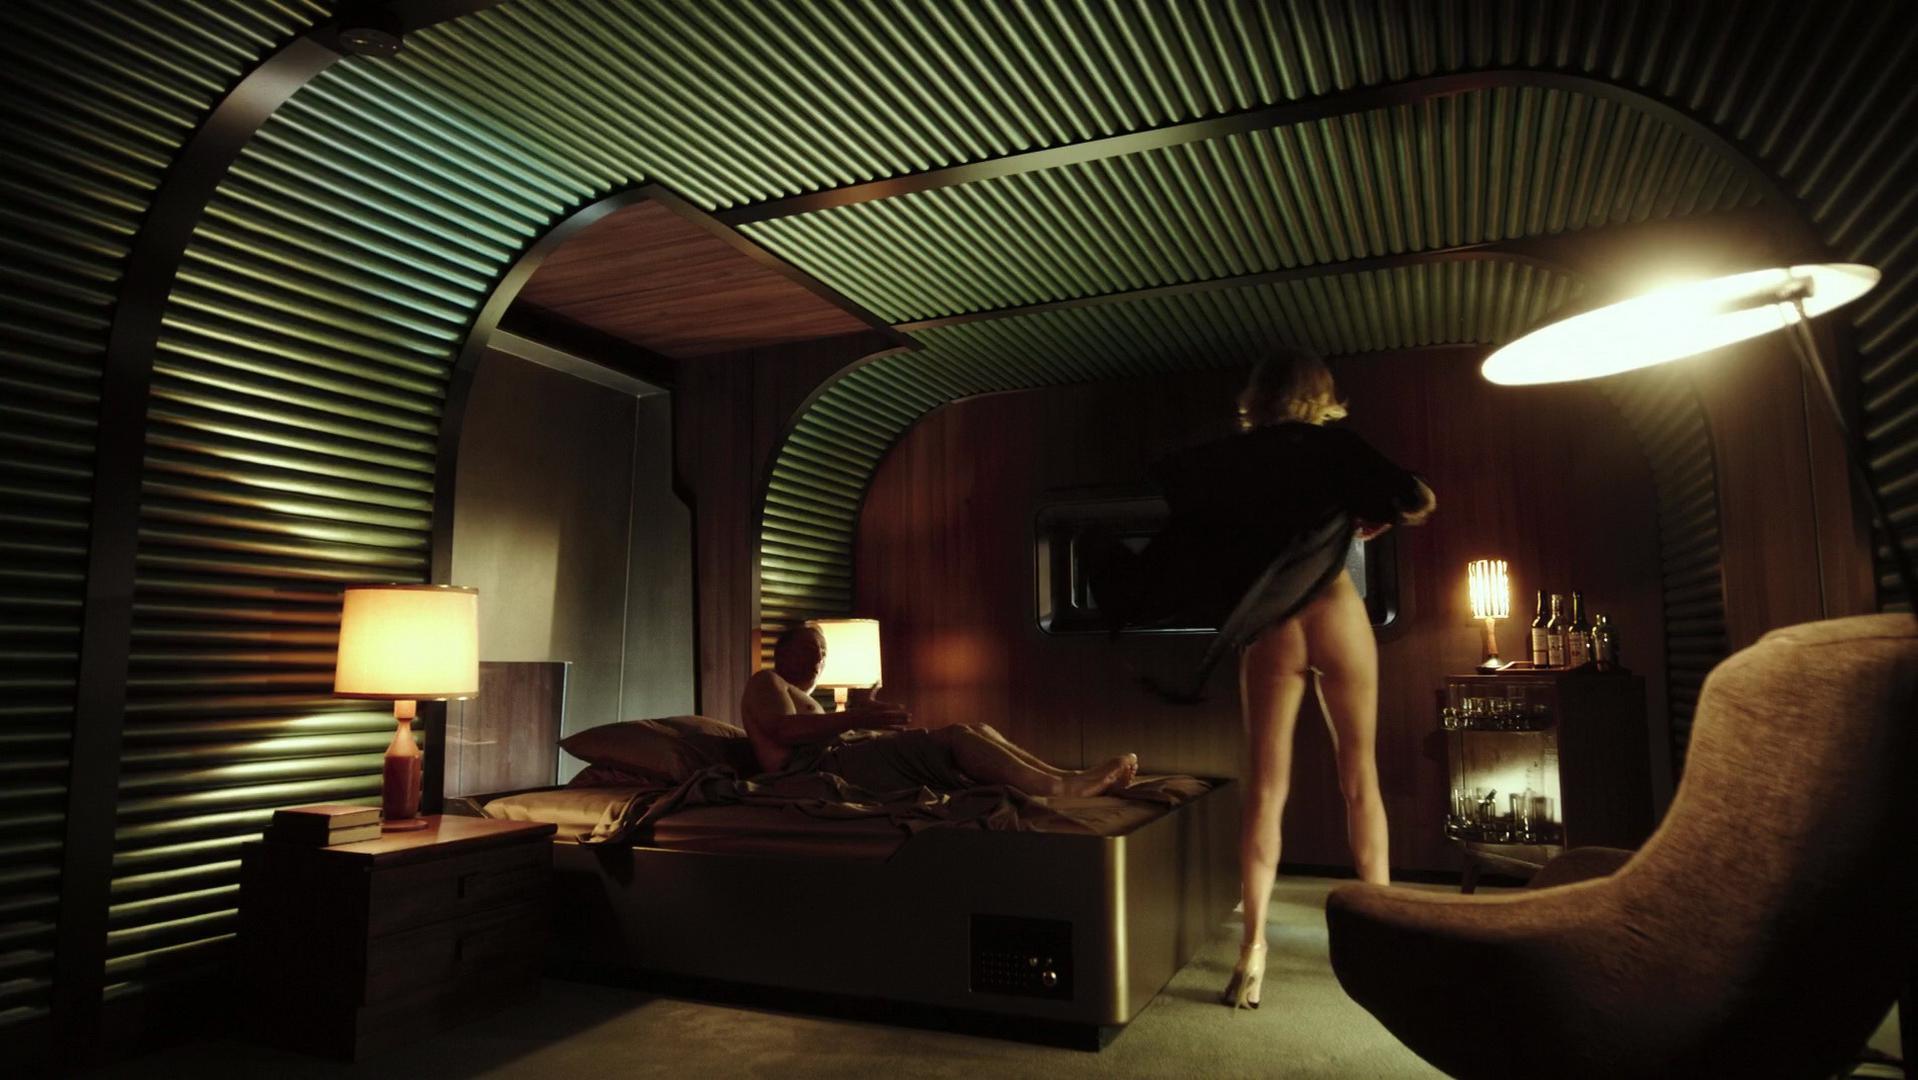 Tricia Helfer nude, Jessica Sipos sexy - Ascension (2014)